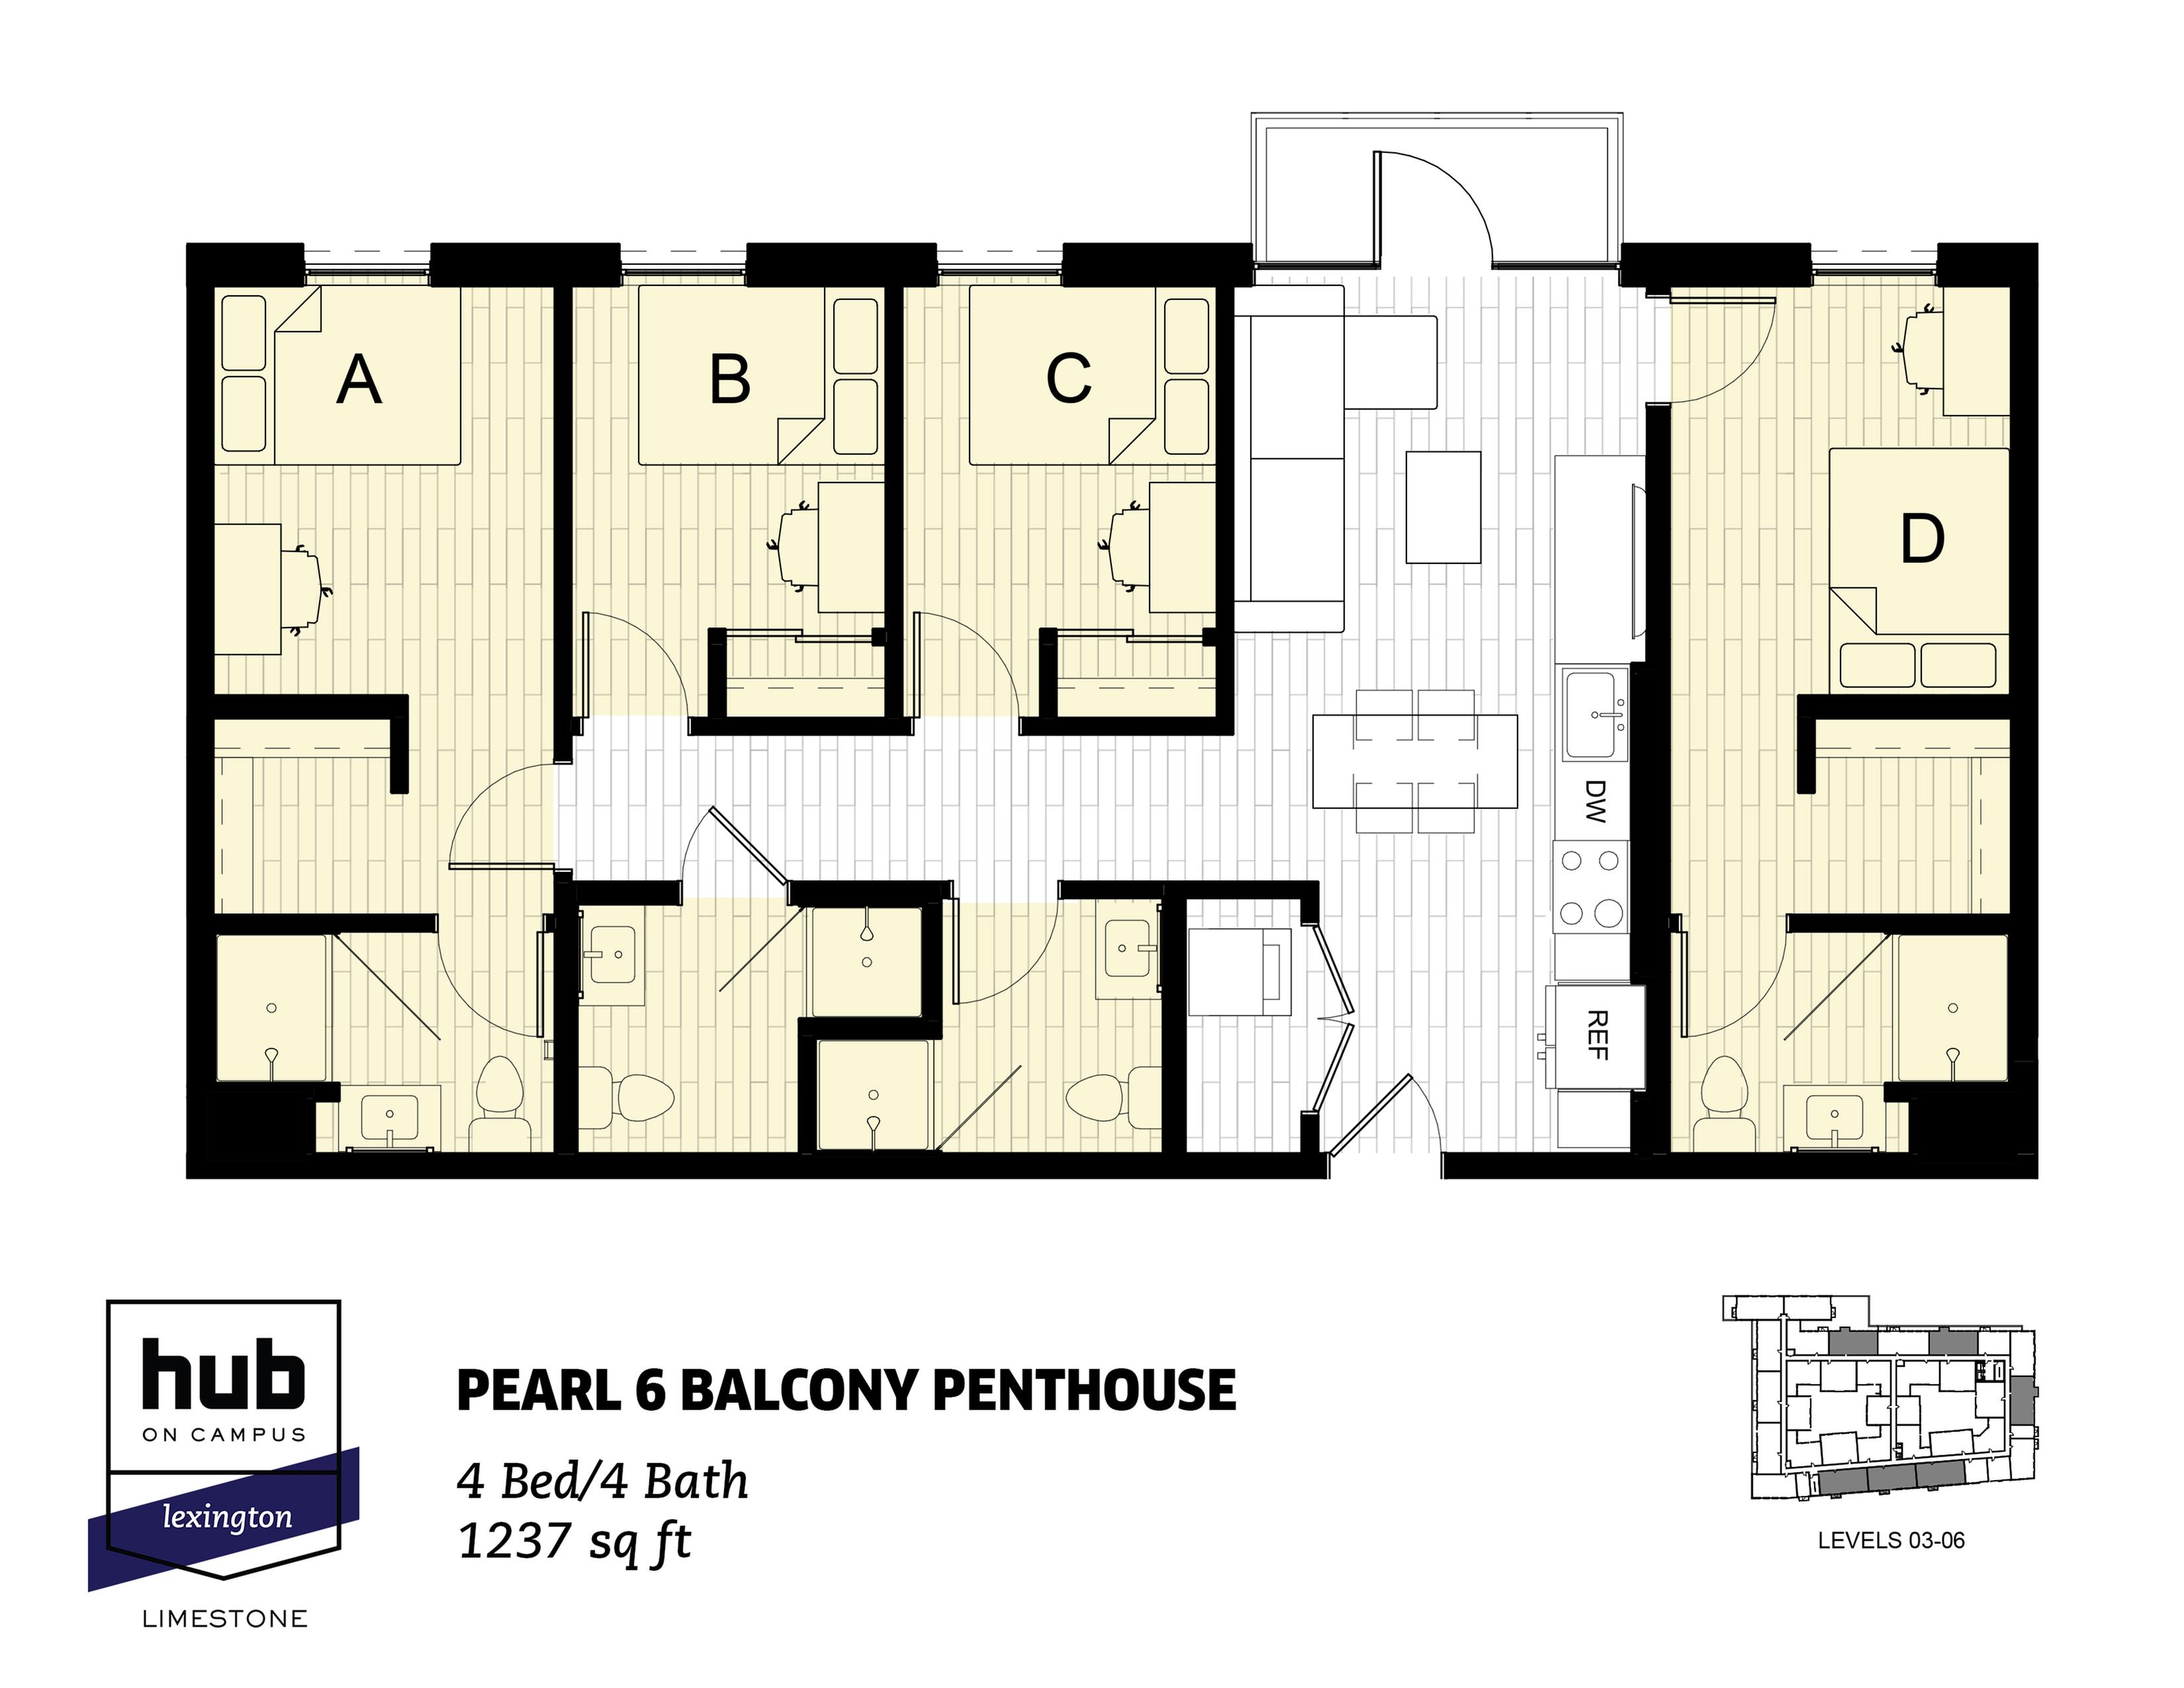 Pearl 6 Balcony Penthouse